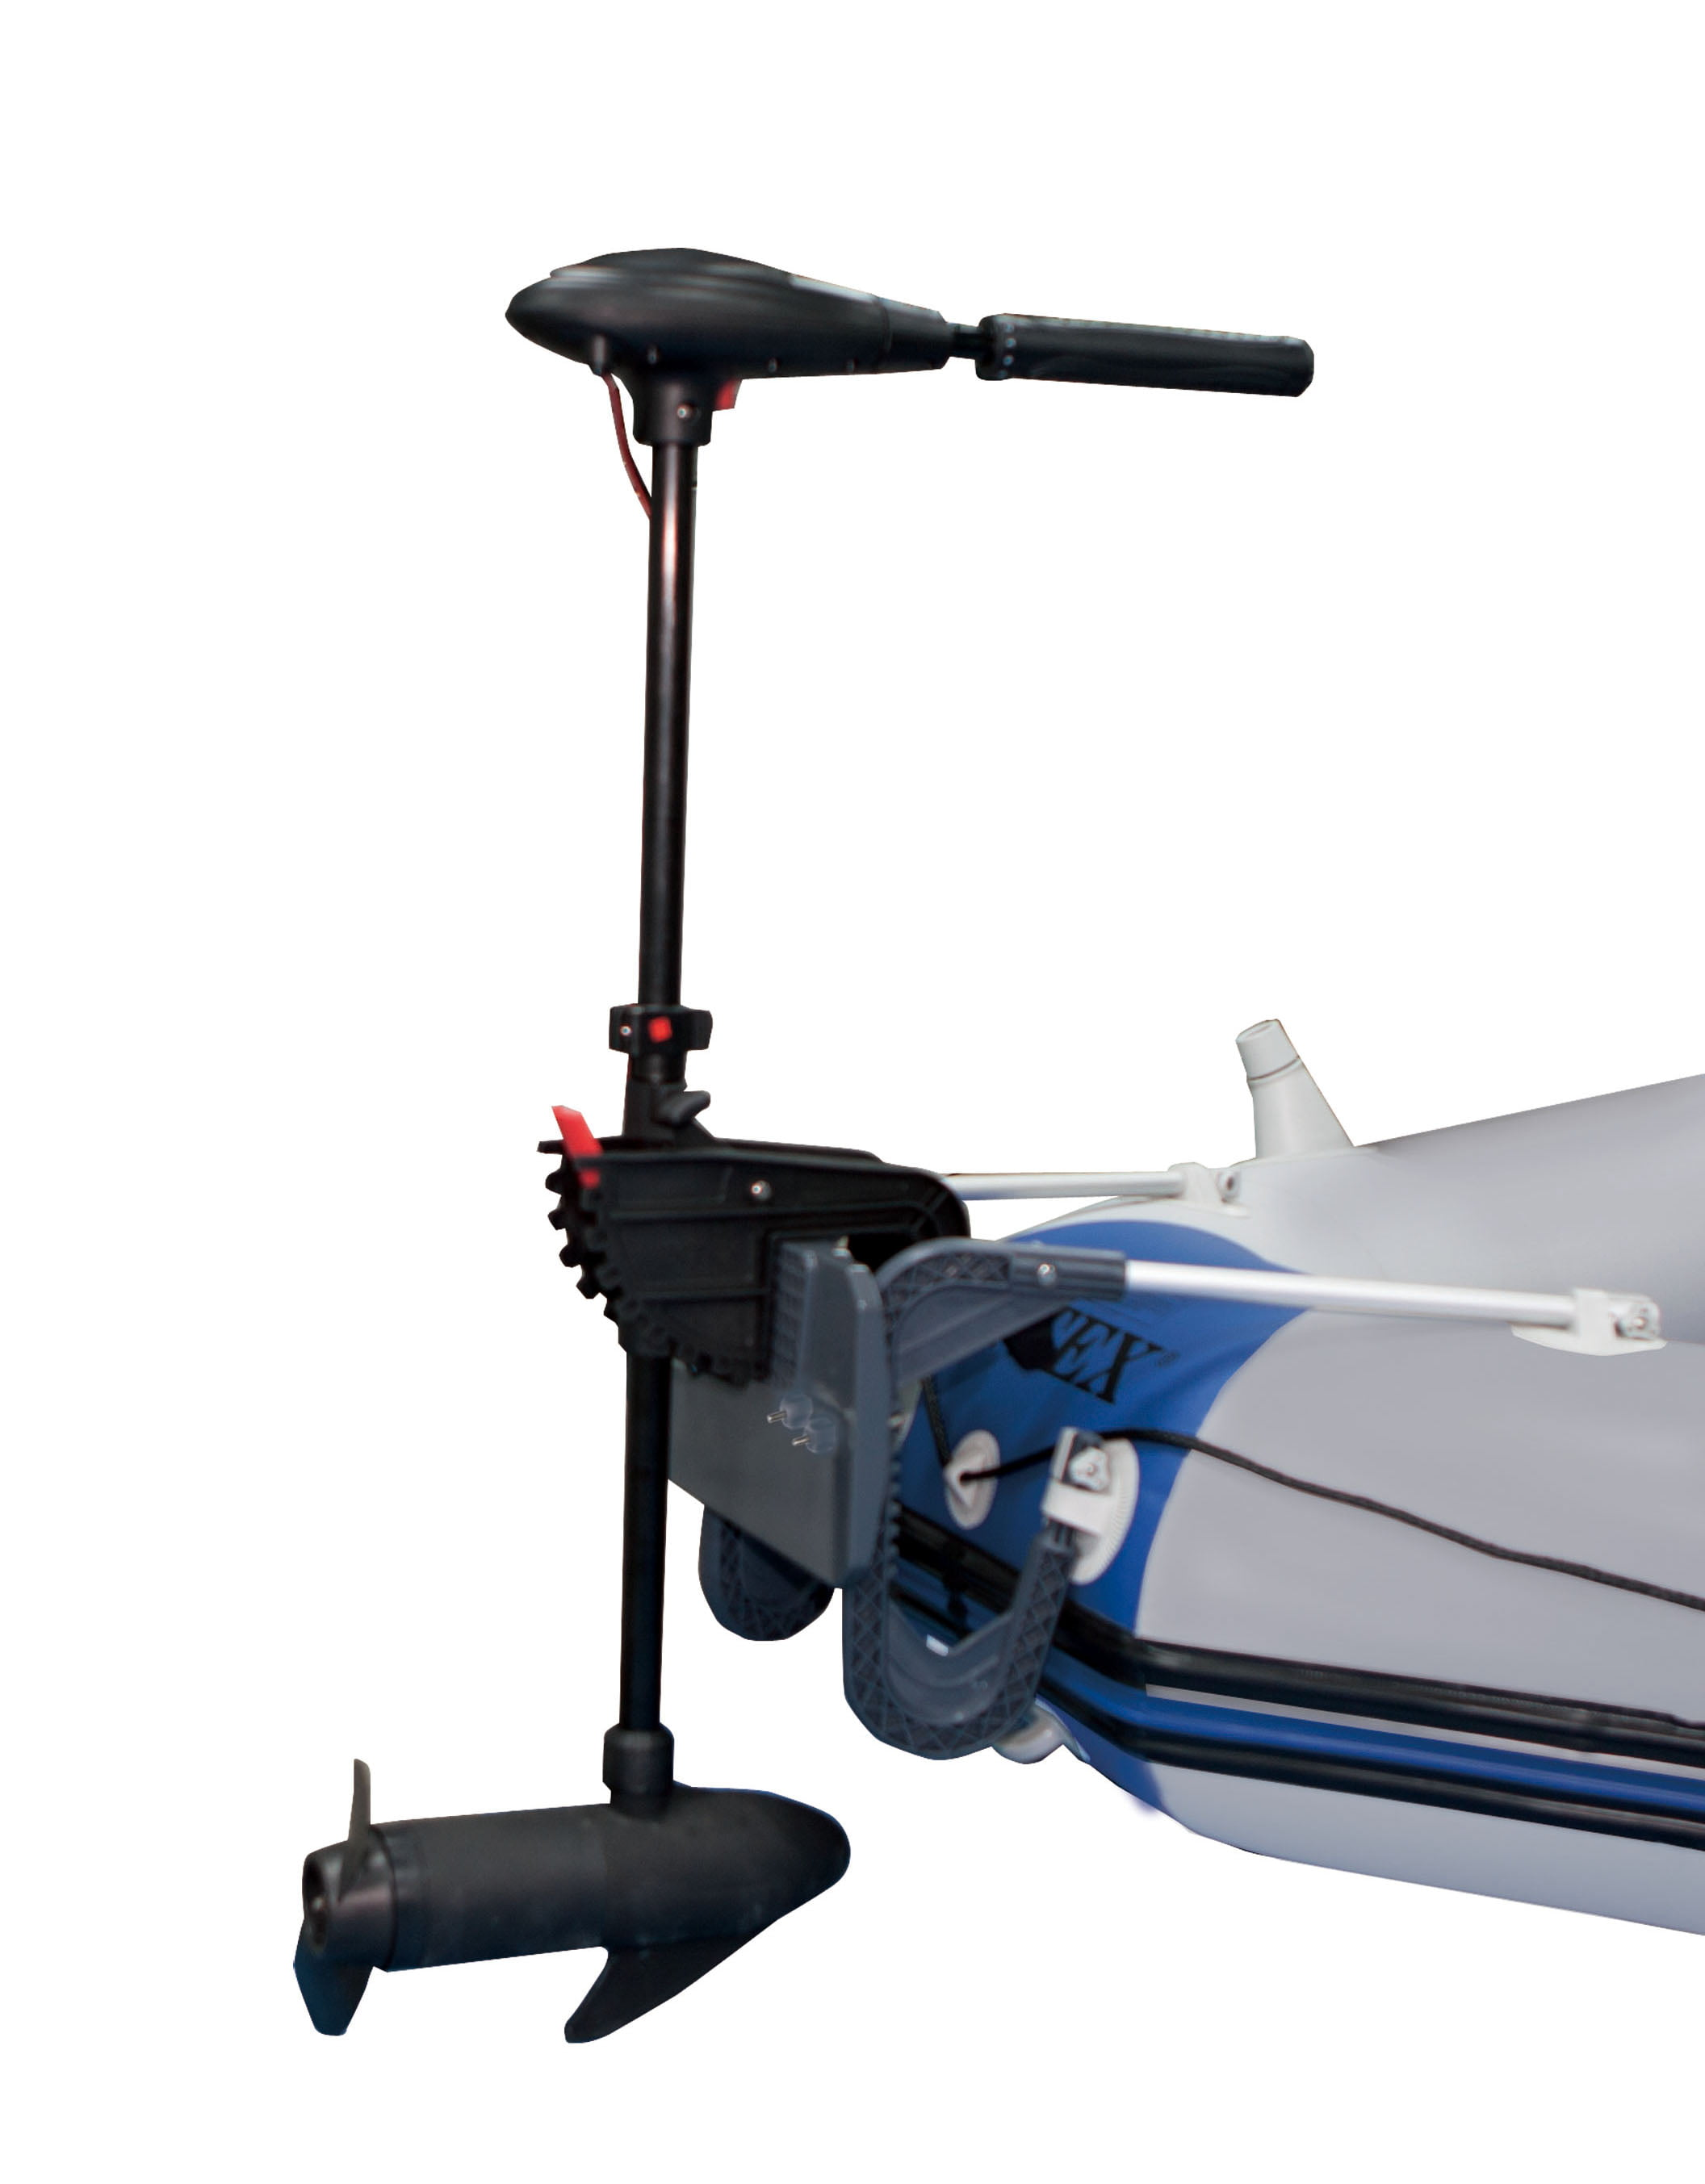 Intex 12V Trolling Motor for Intex Inflatable Boats by Intex Trading Ltd.